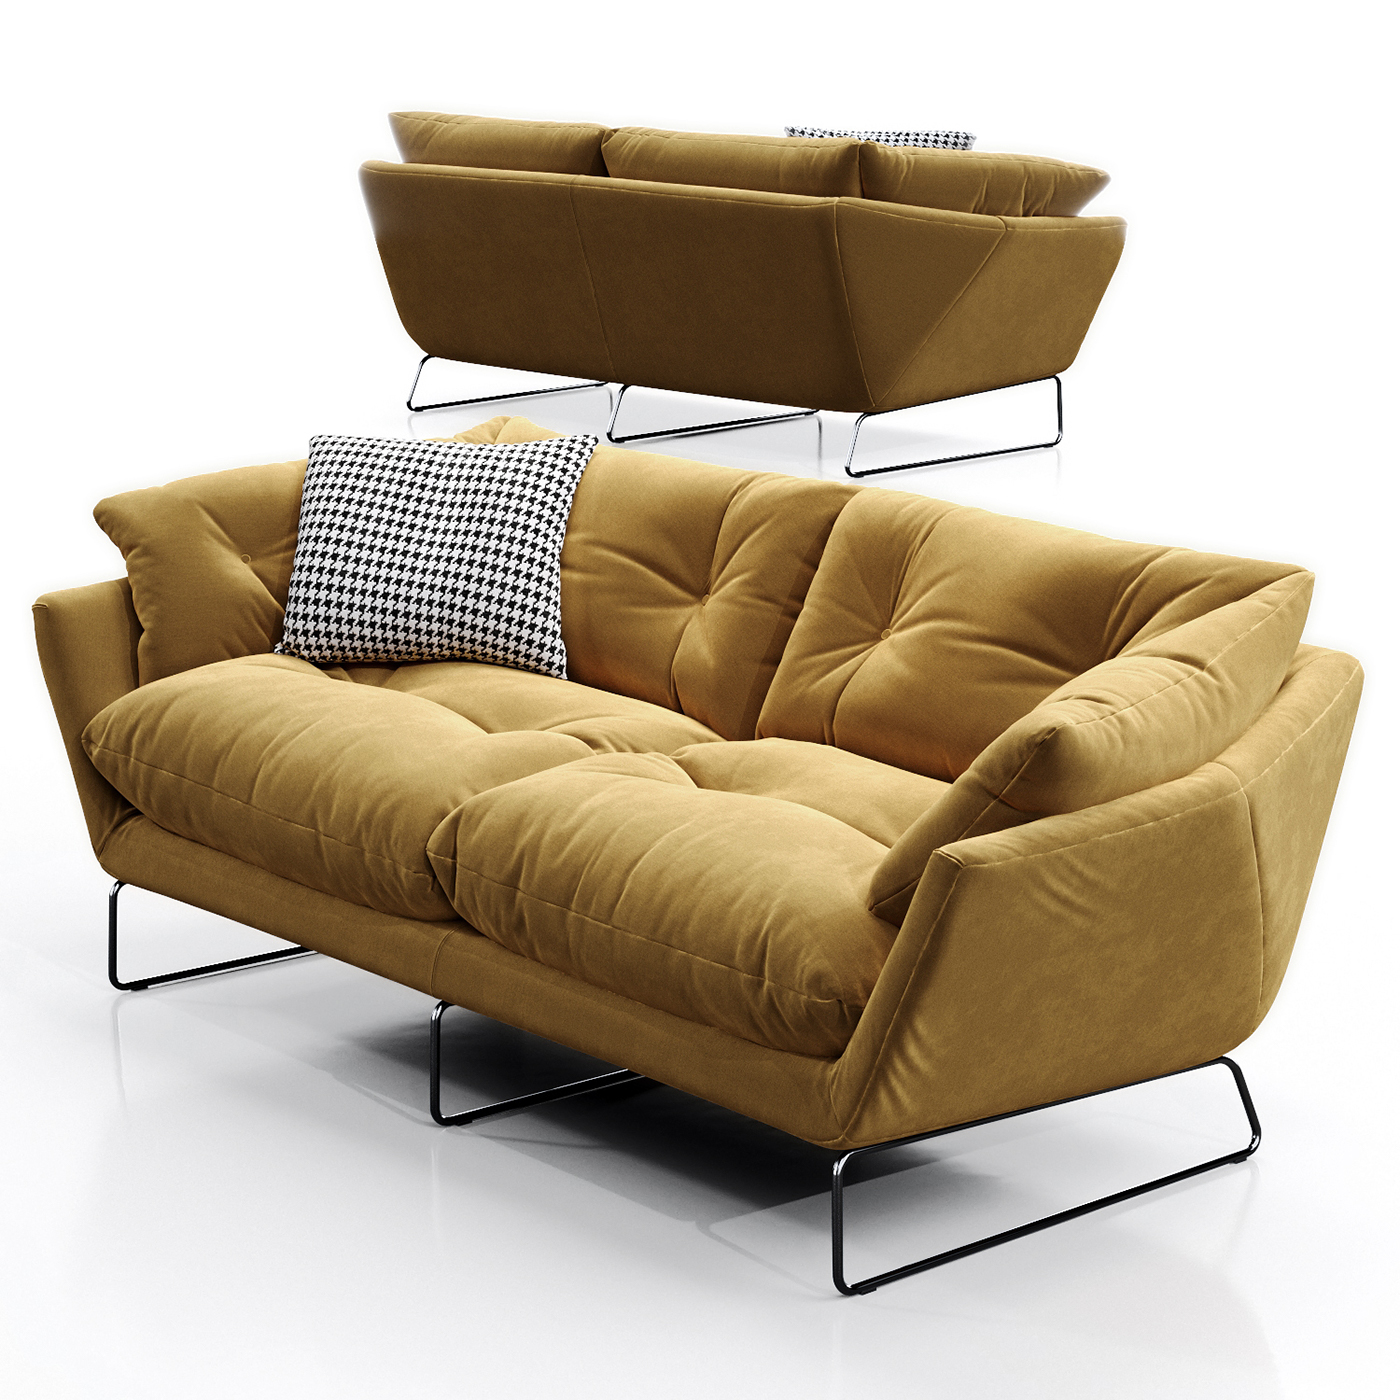 buy sofa bed new york folding table 3d model saba italia suite on behance